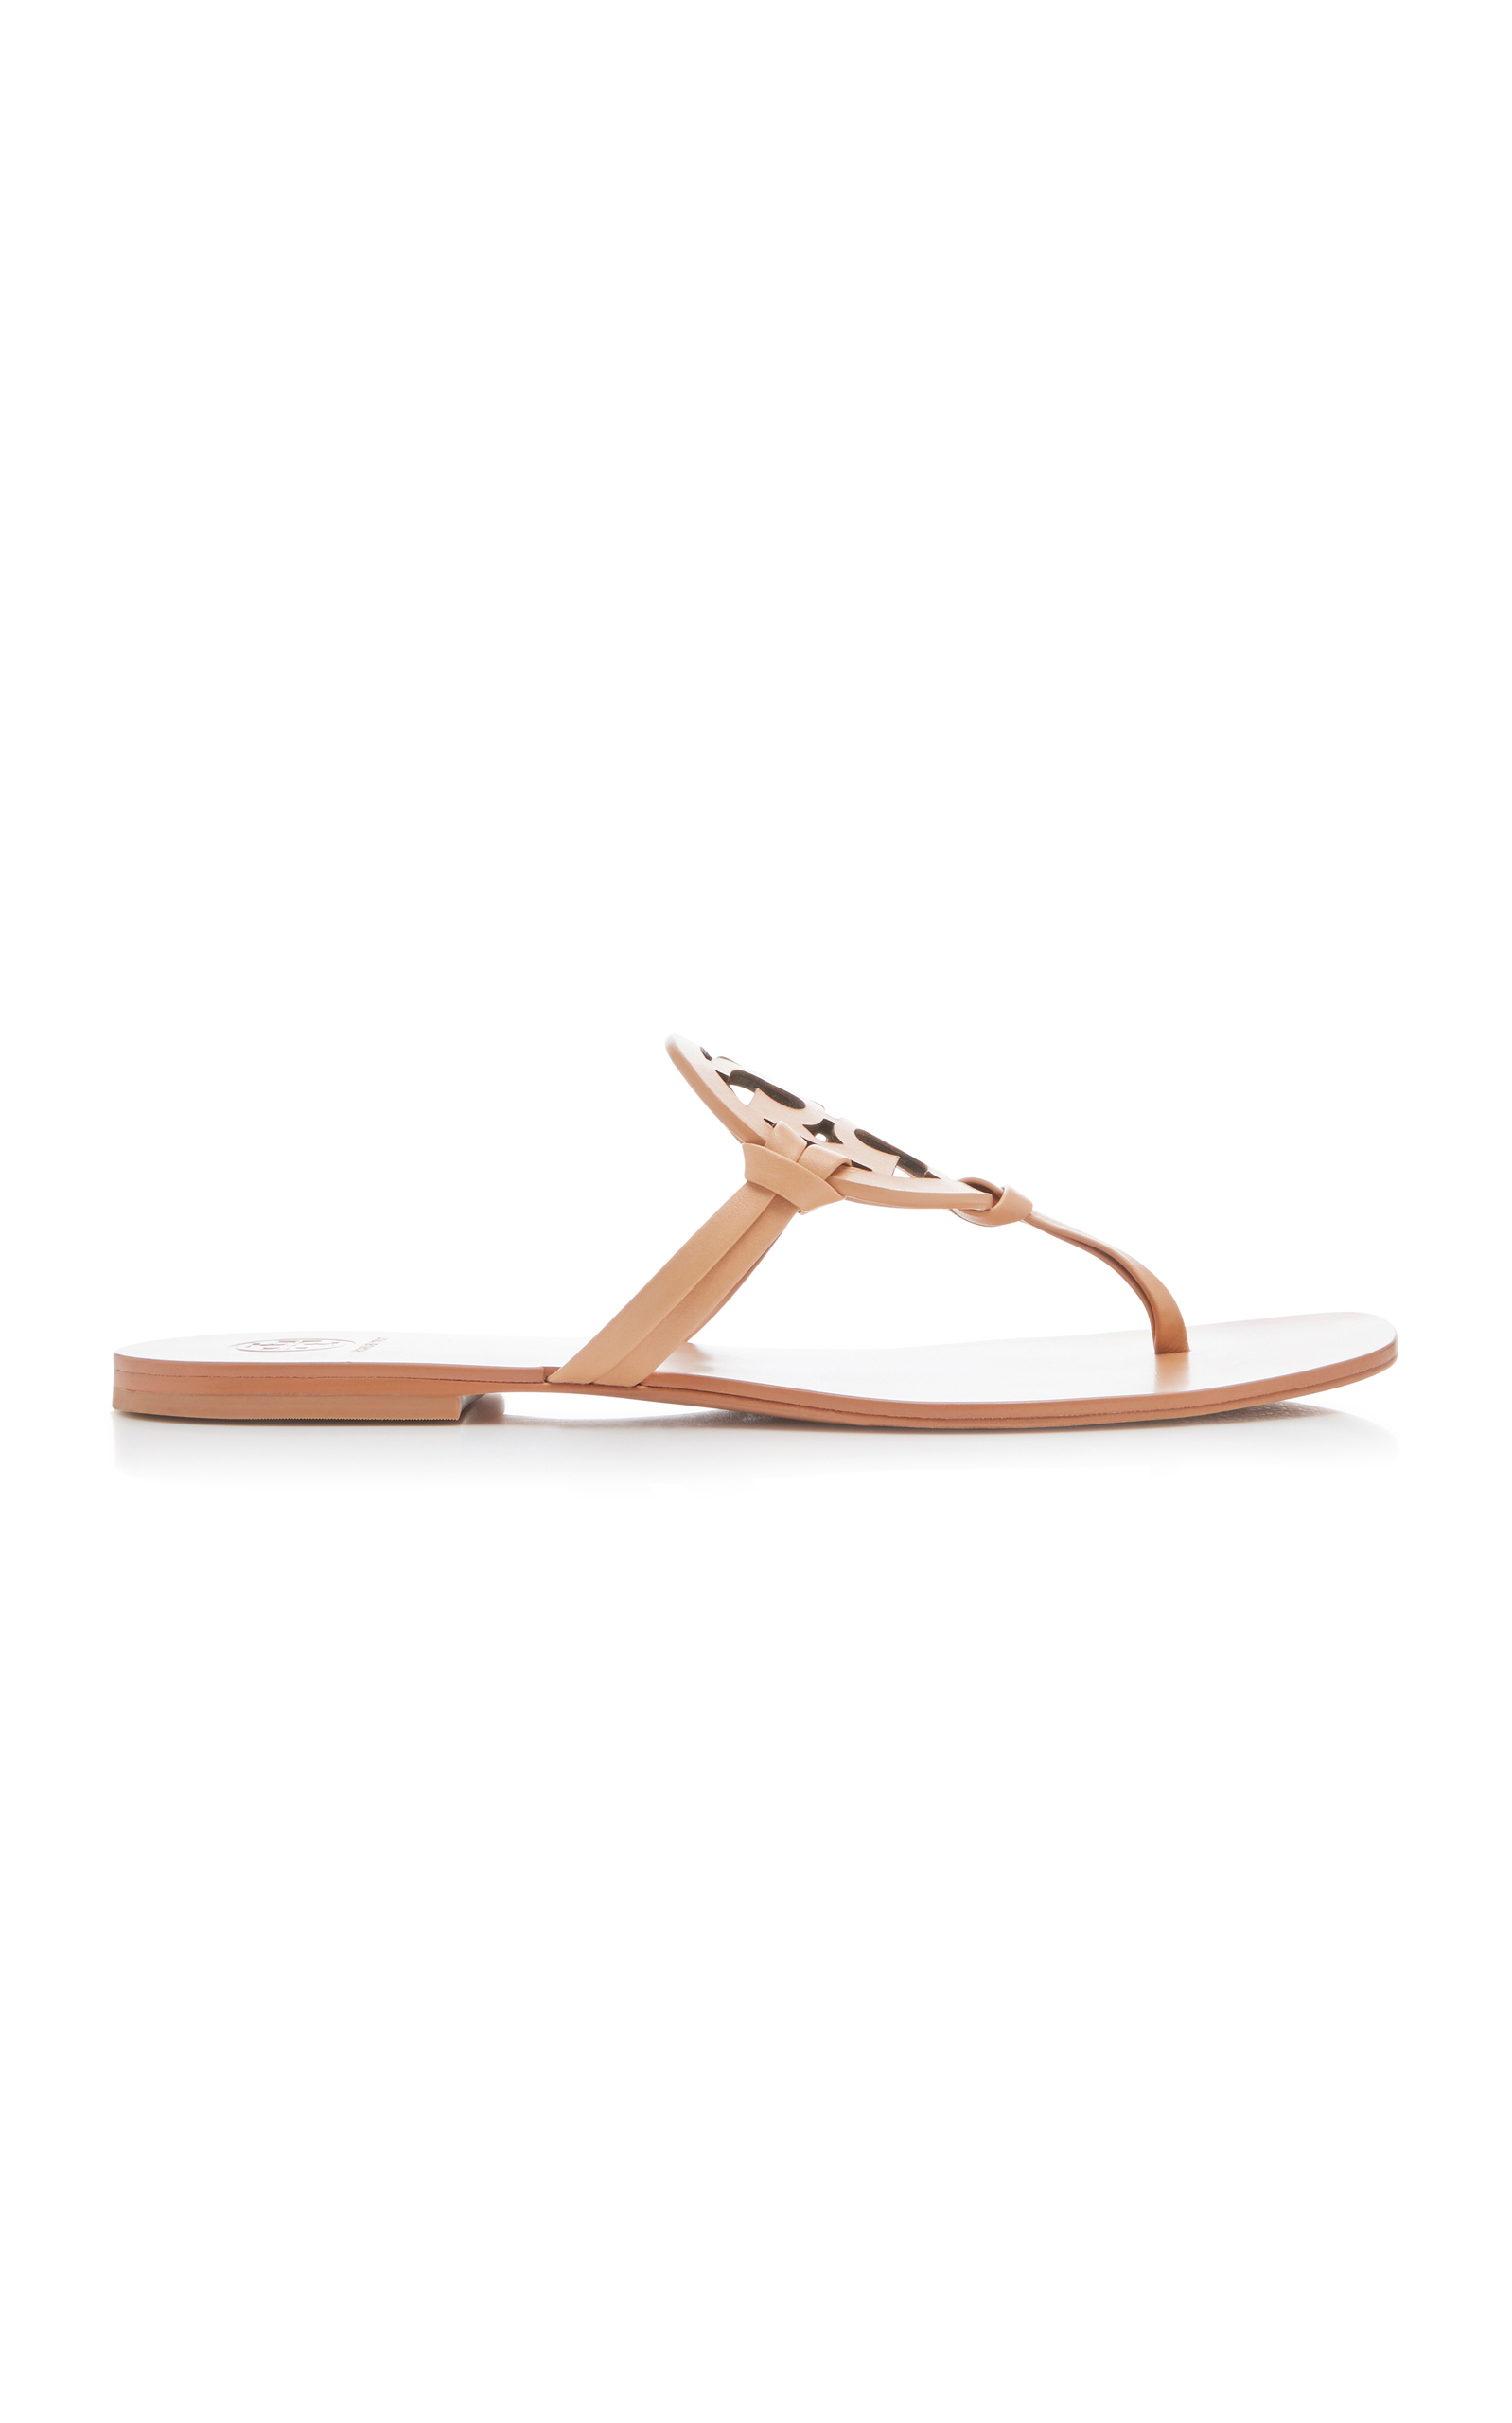 8625e14cf413 Tory BurchSquare Toe Miller Sandal. CLOSE. Loading